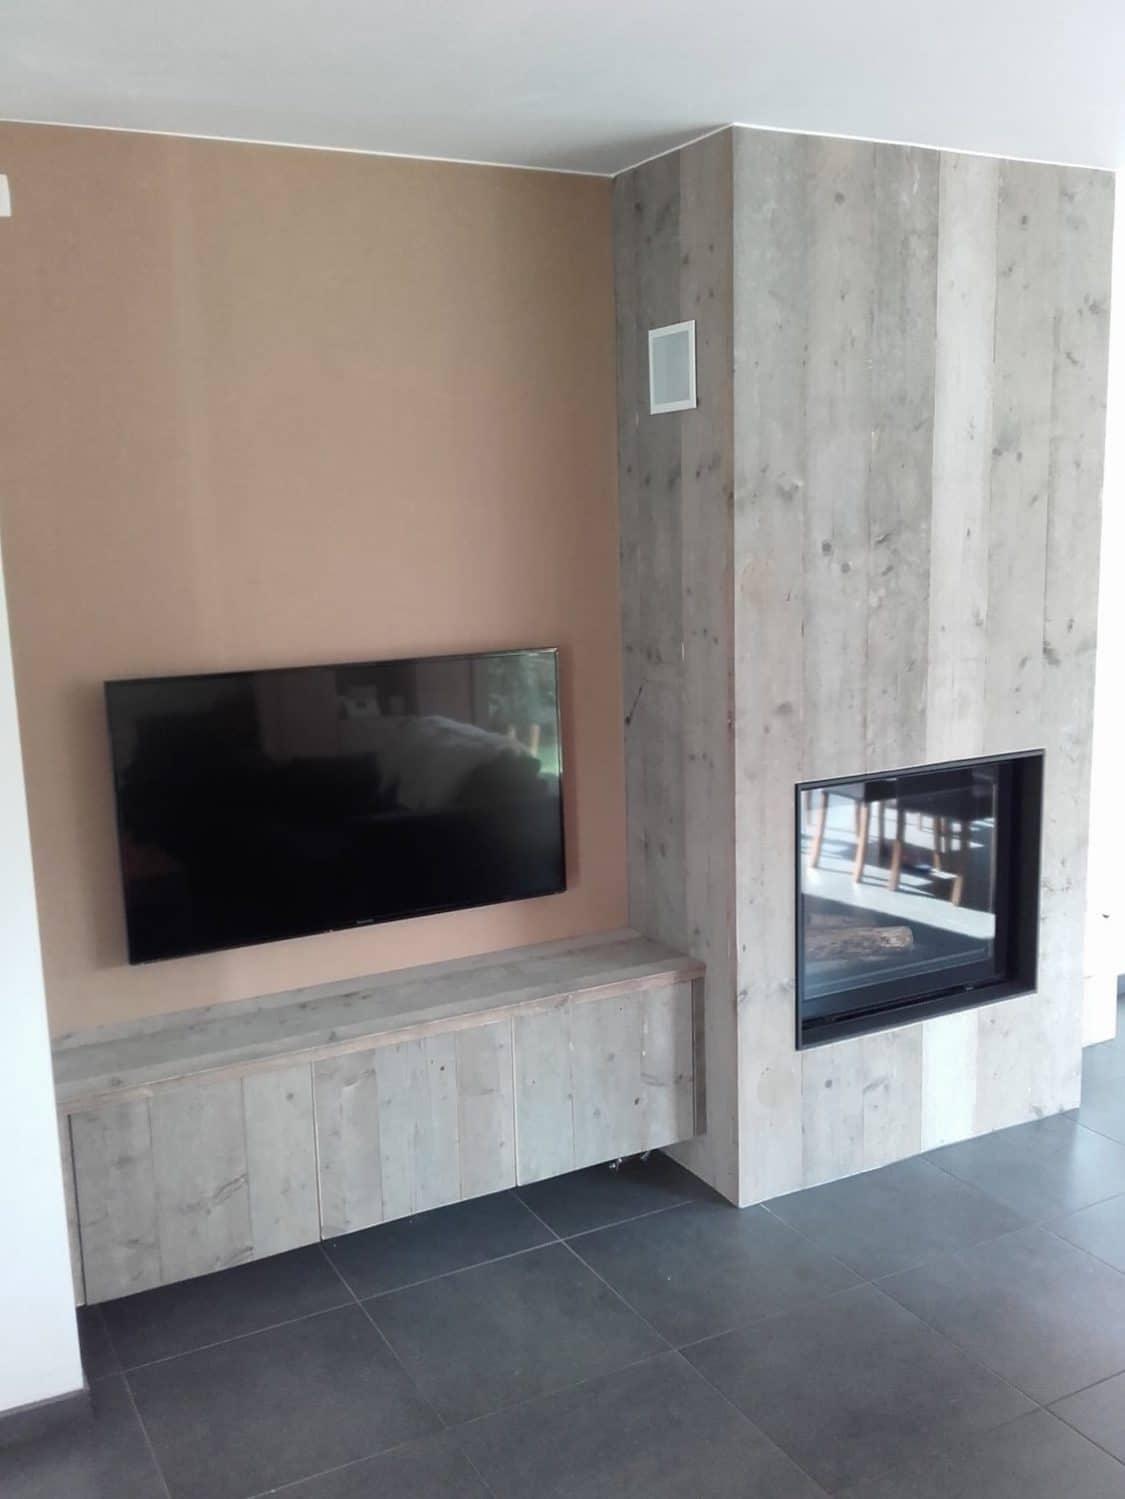 Deboosere interieurinrichting | Haardwand Steigerhout image 18